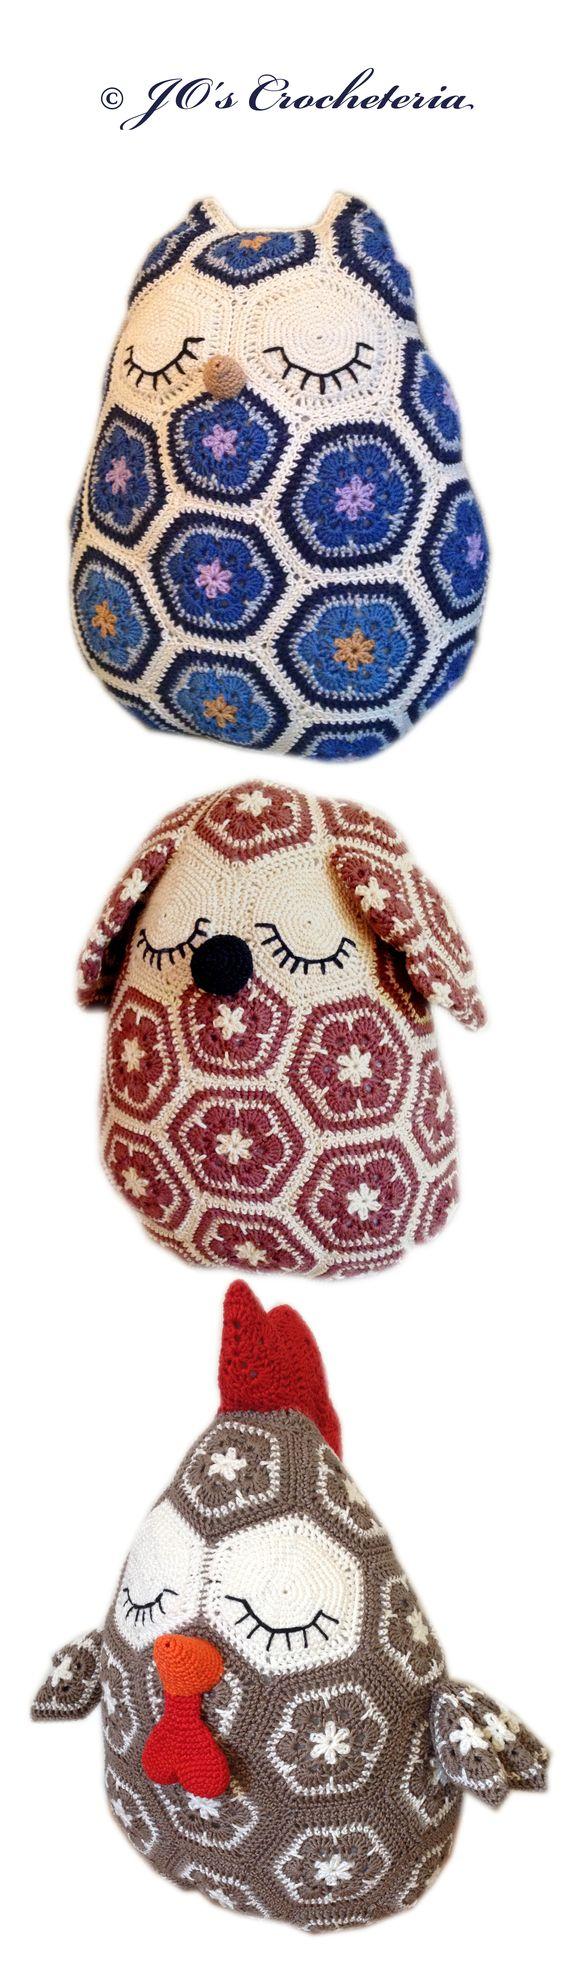 Crochet African Flower Animal Patterns : Animal pillows, African flowers and Flower crochet on ...